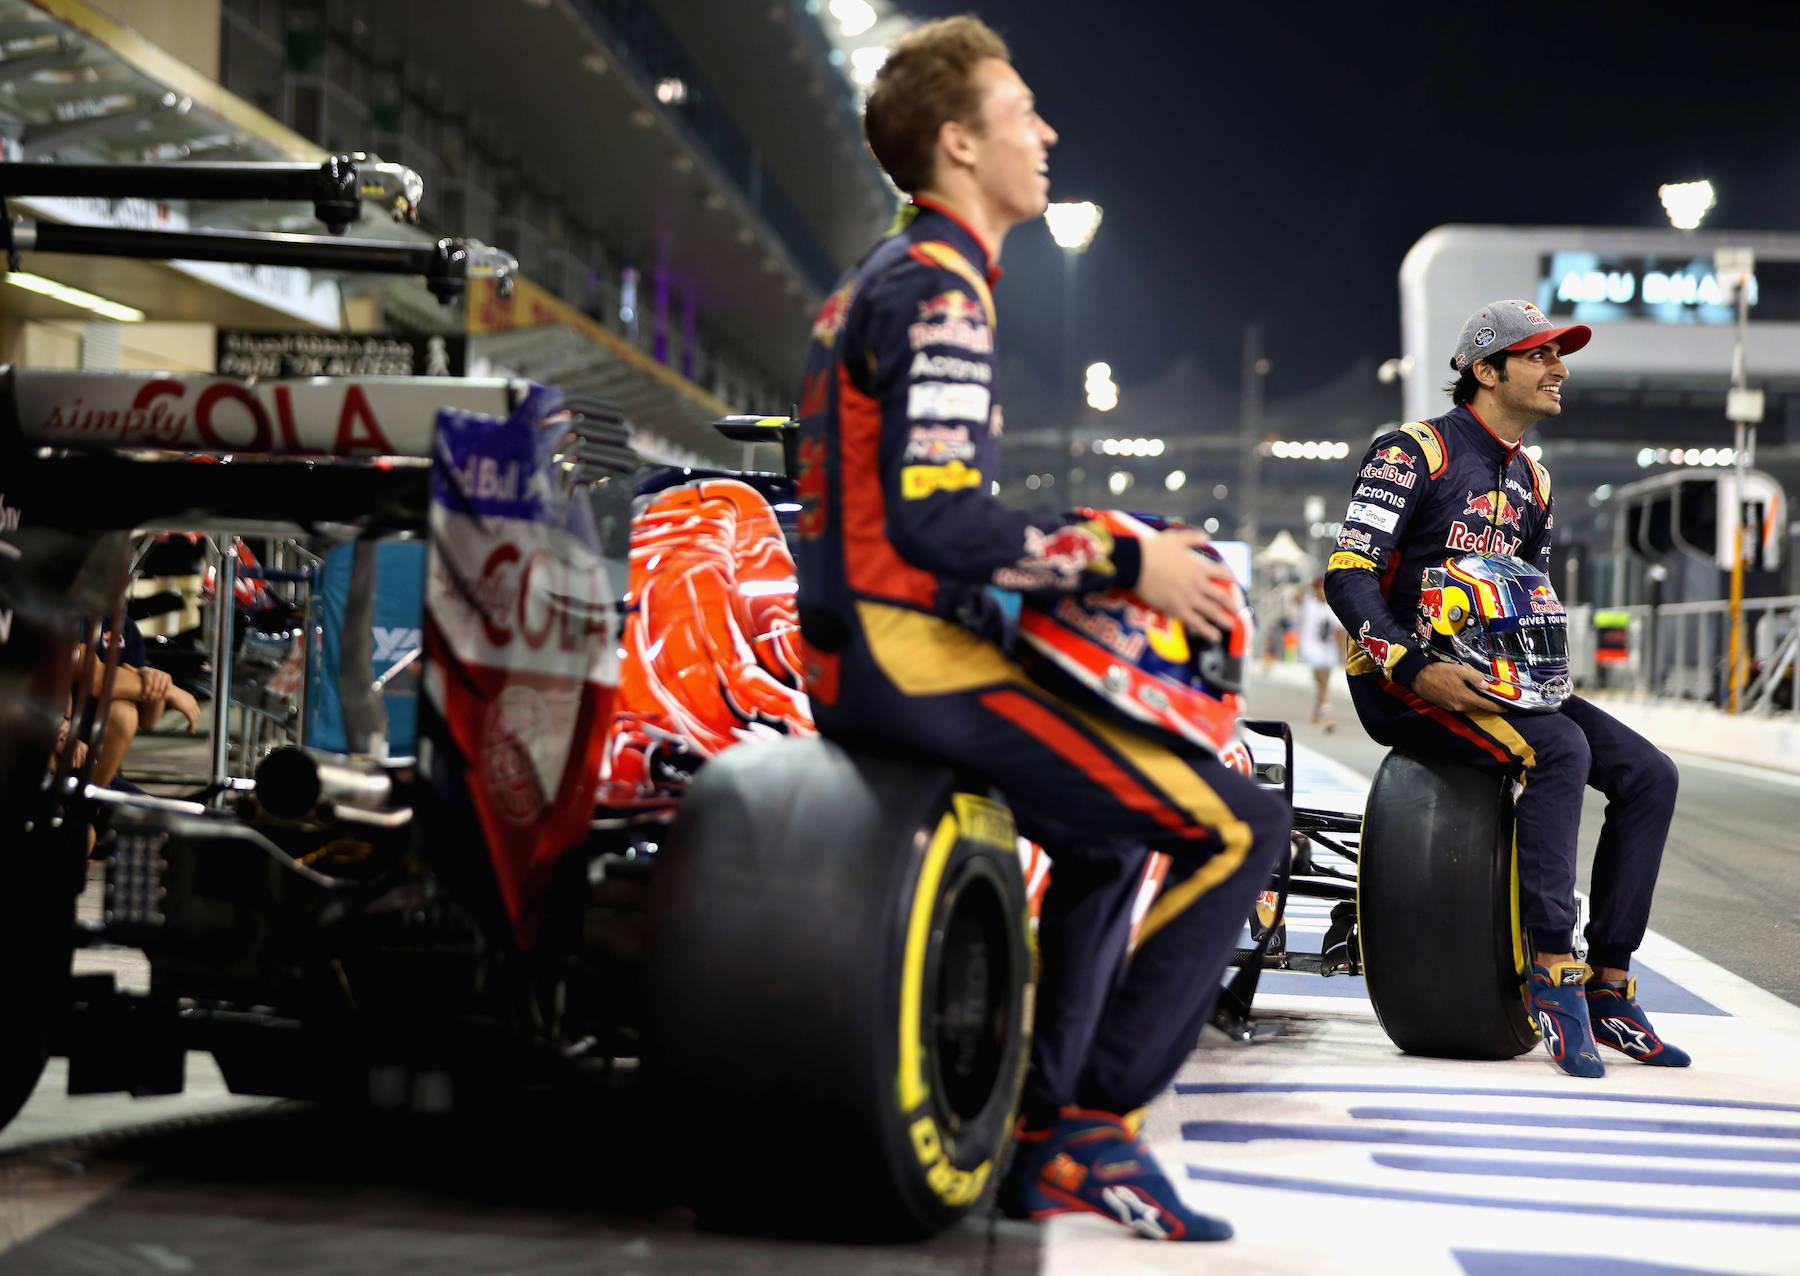 Salracing - Scuderia Toro Rosso team photo